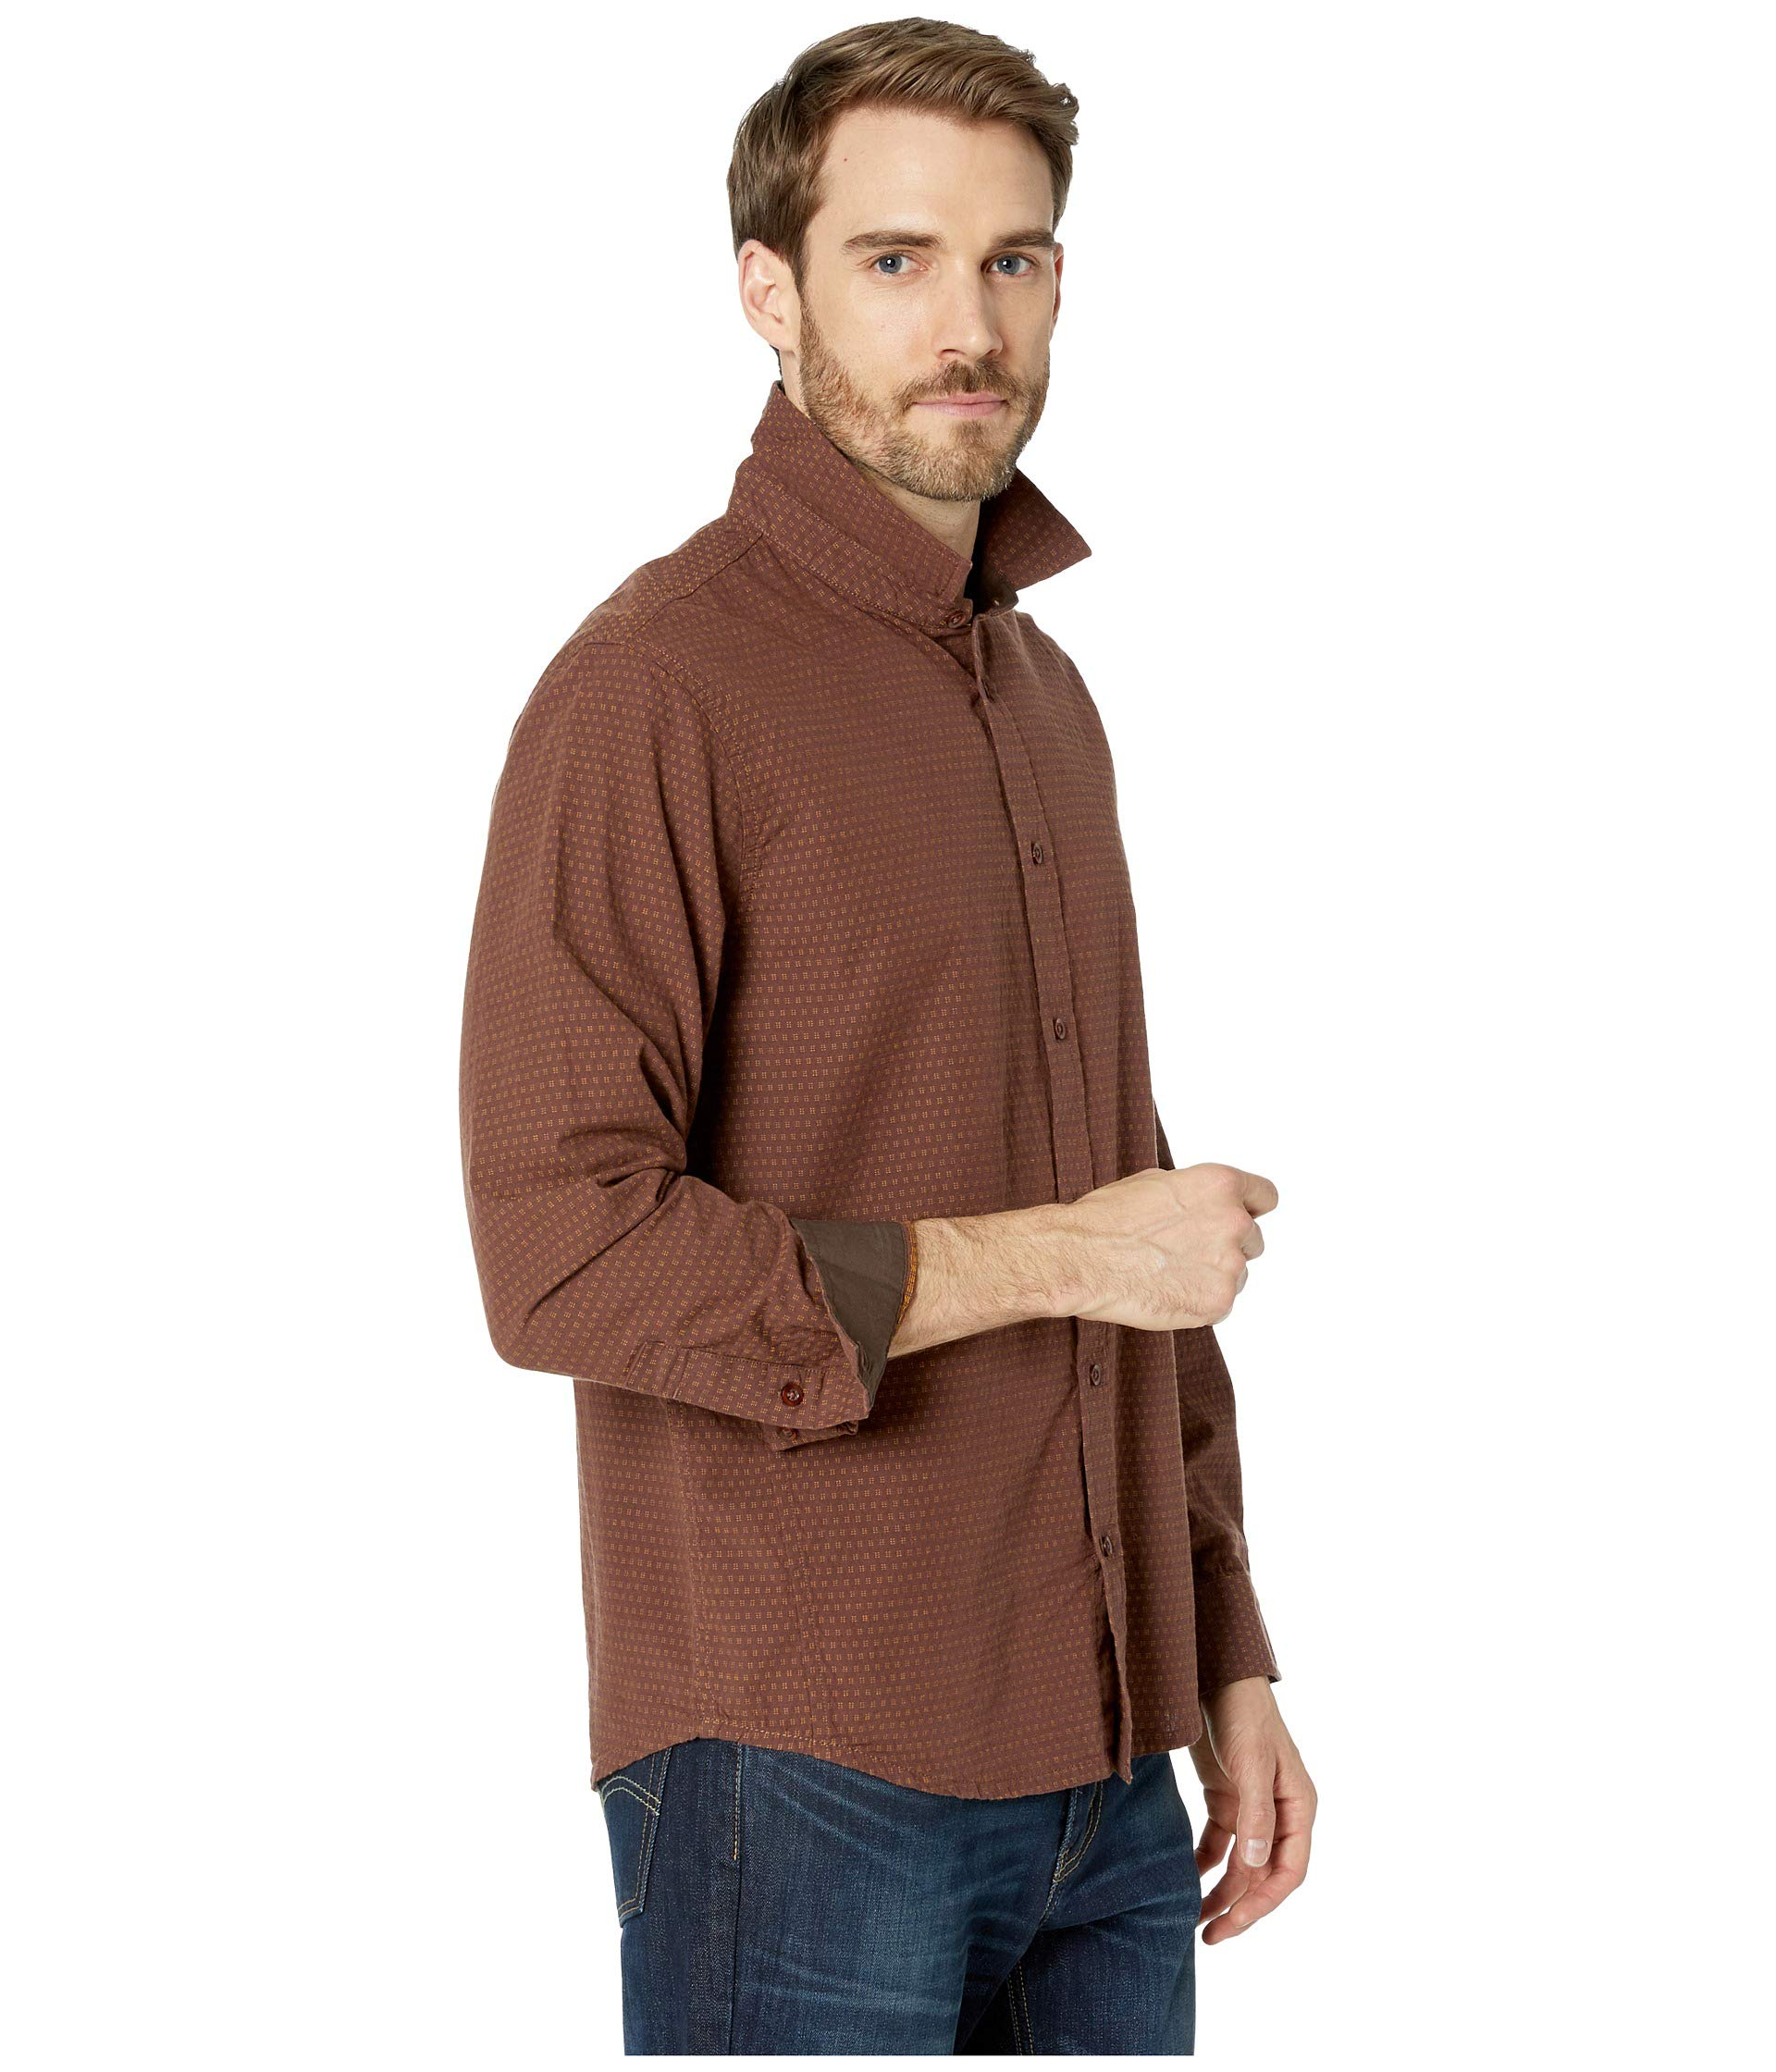 Wood Long Sleeve Shirt Graden Wedged Prana O08SZnwqW